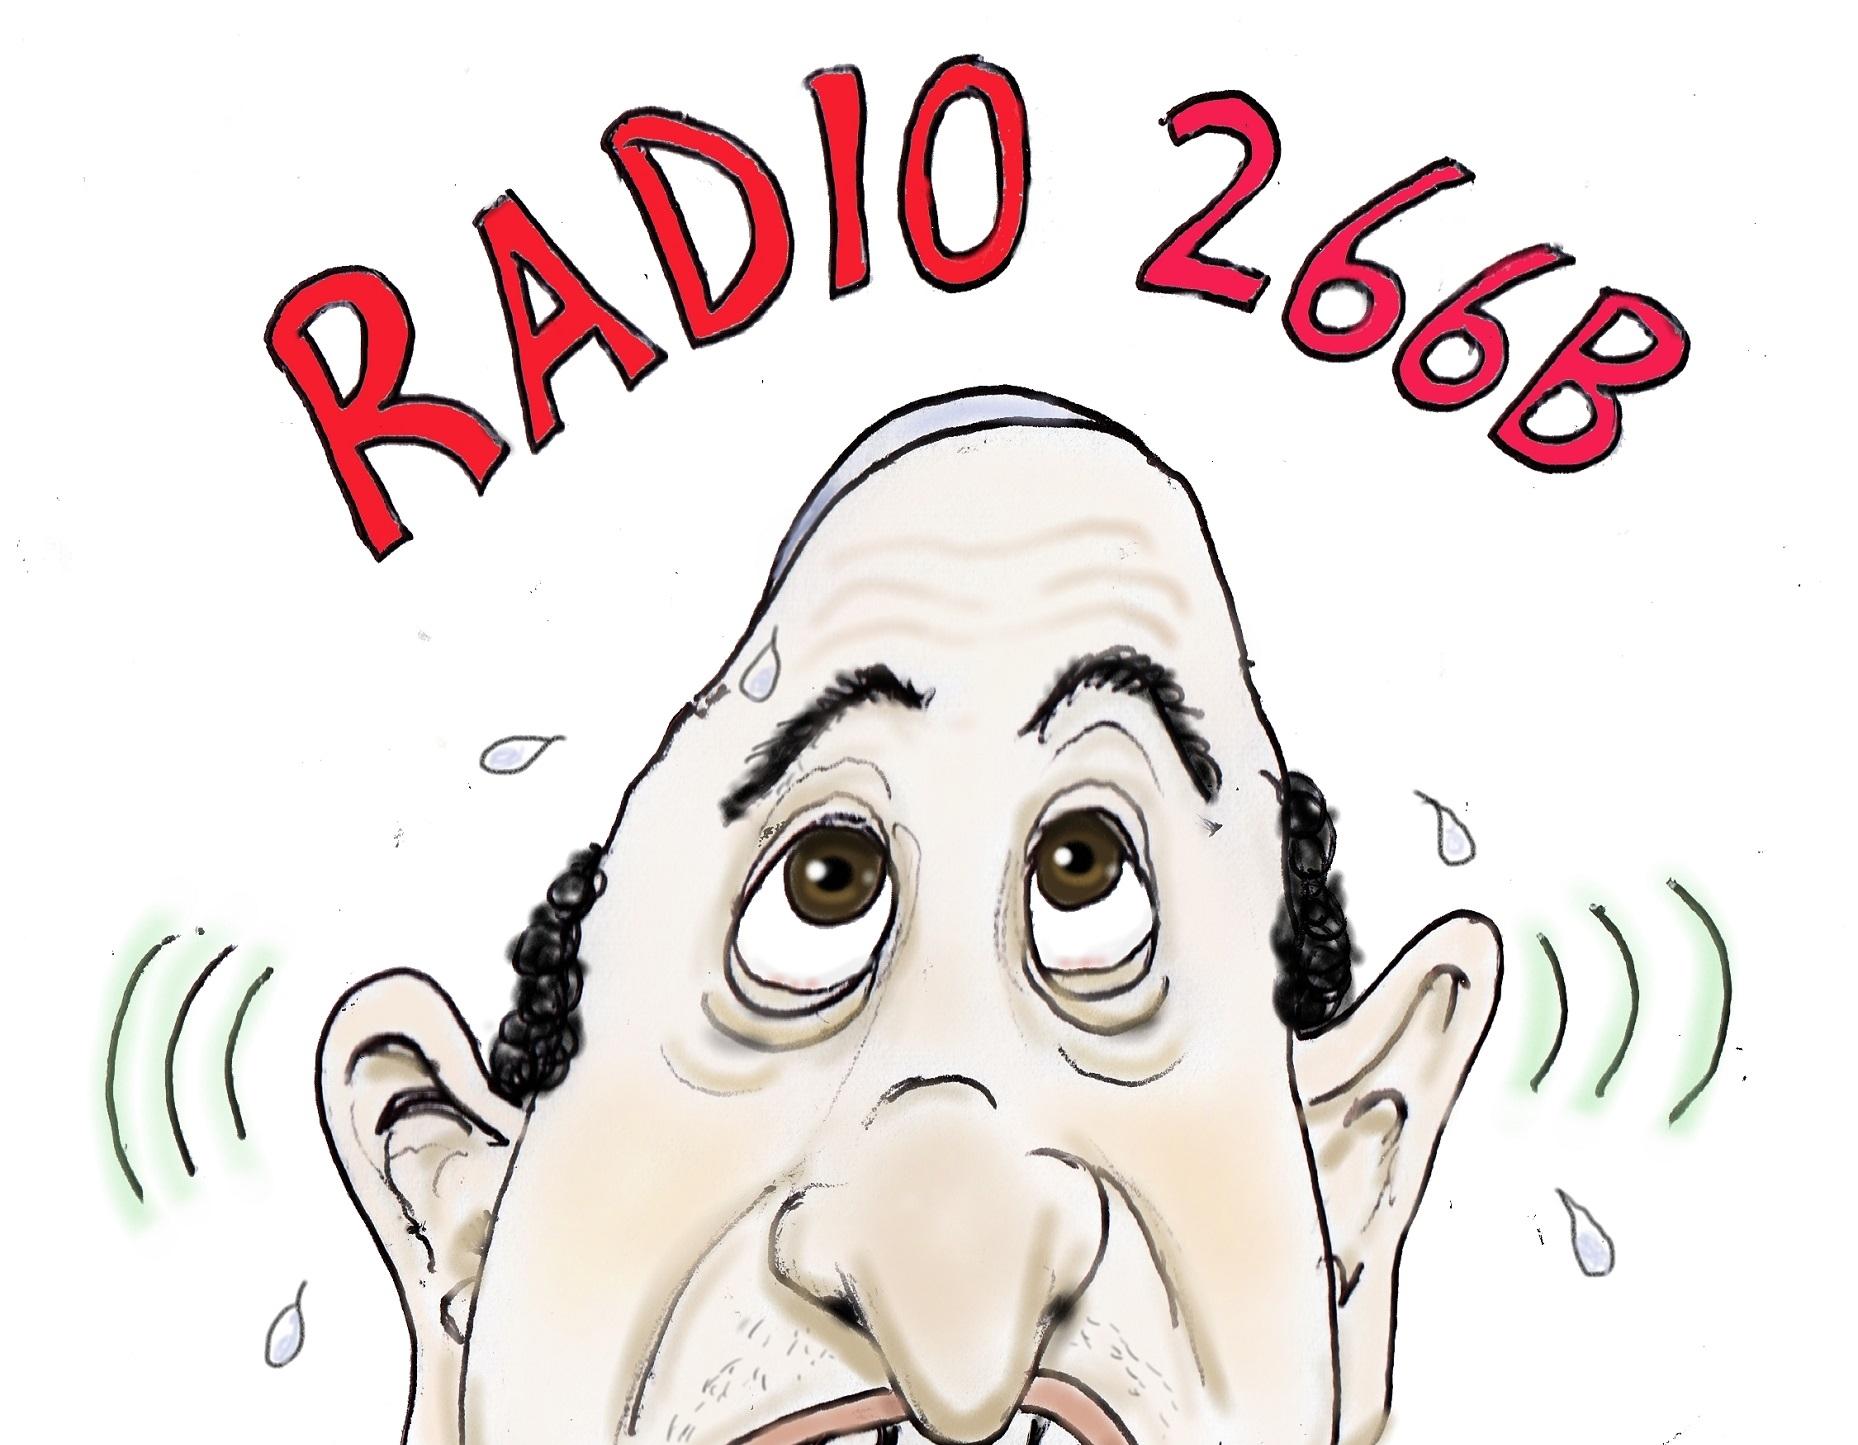 Radio 266b show art